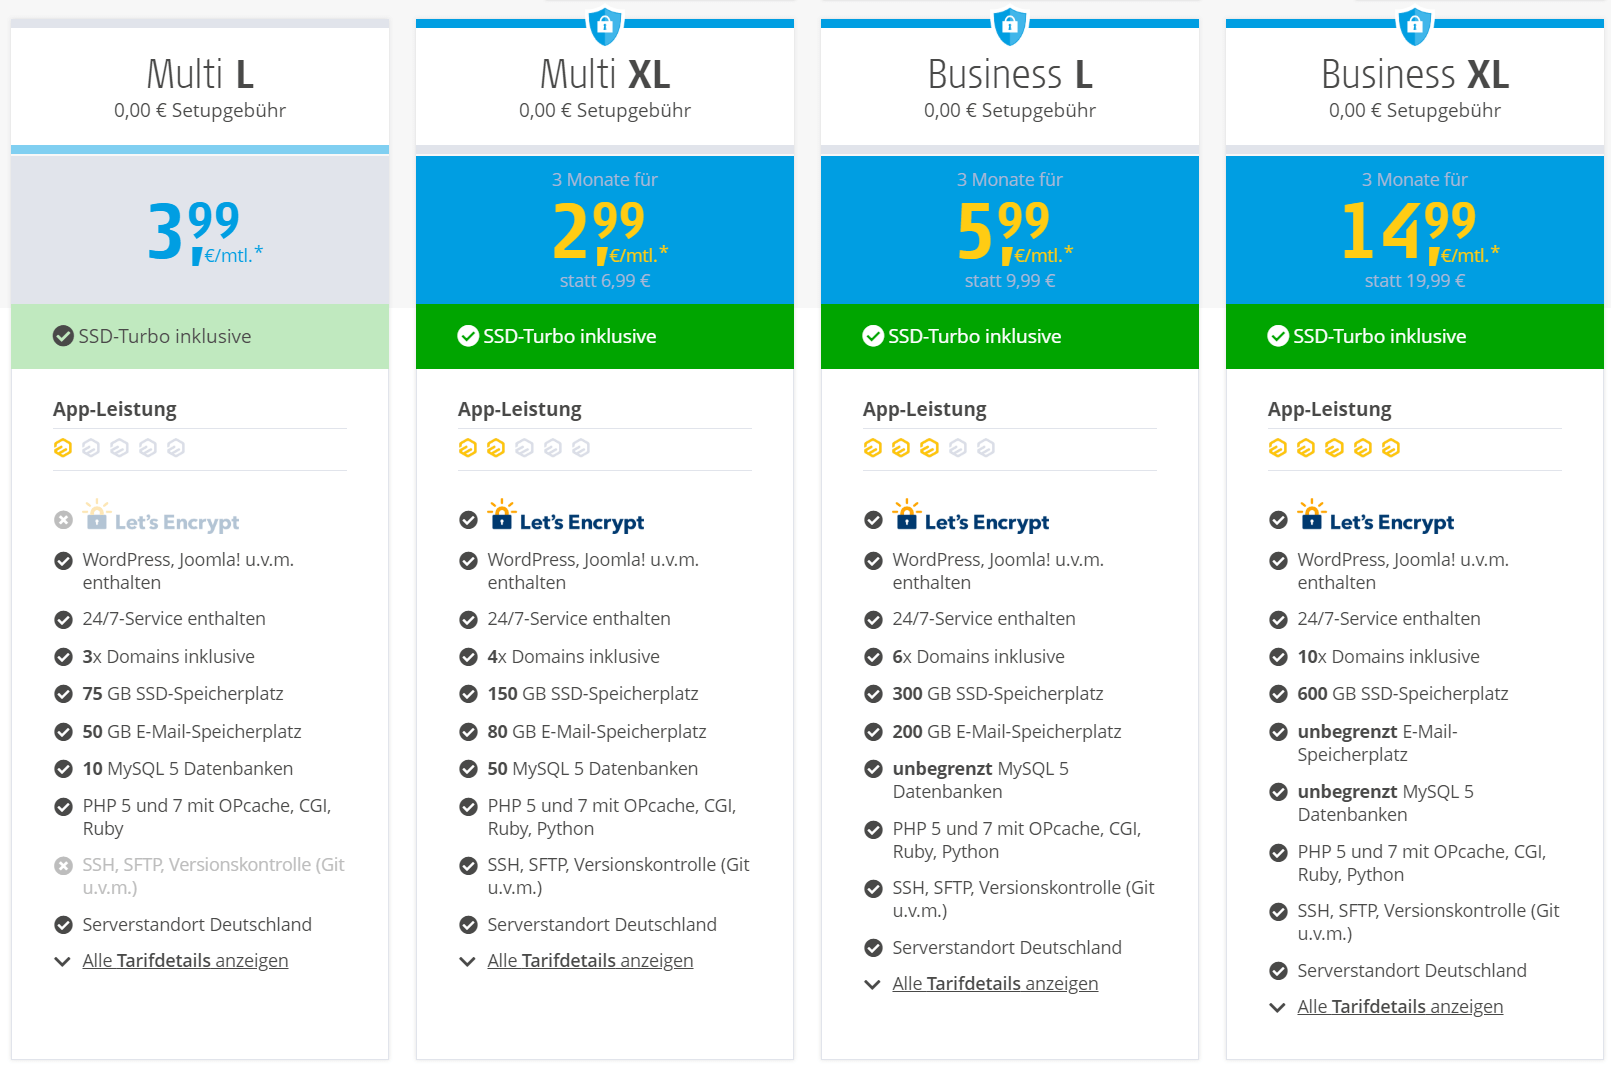 Alfahosting Webhosting Vergleich